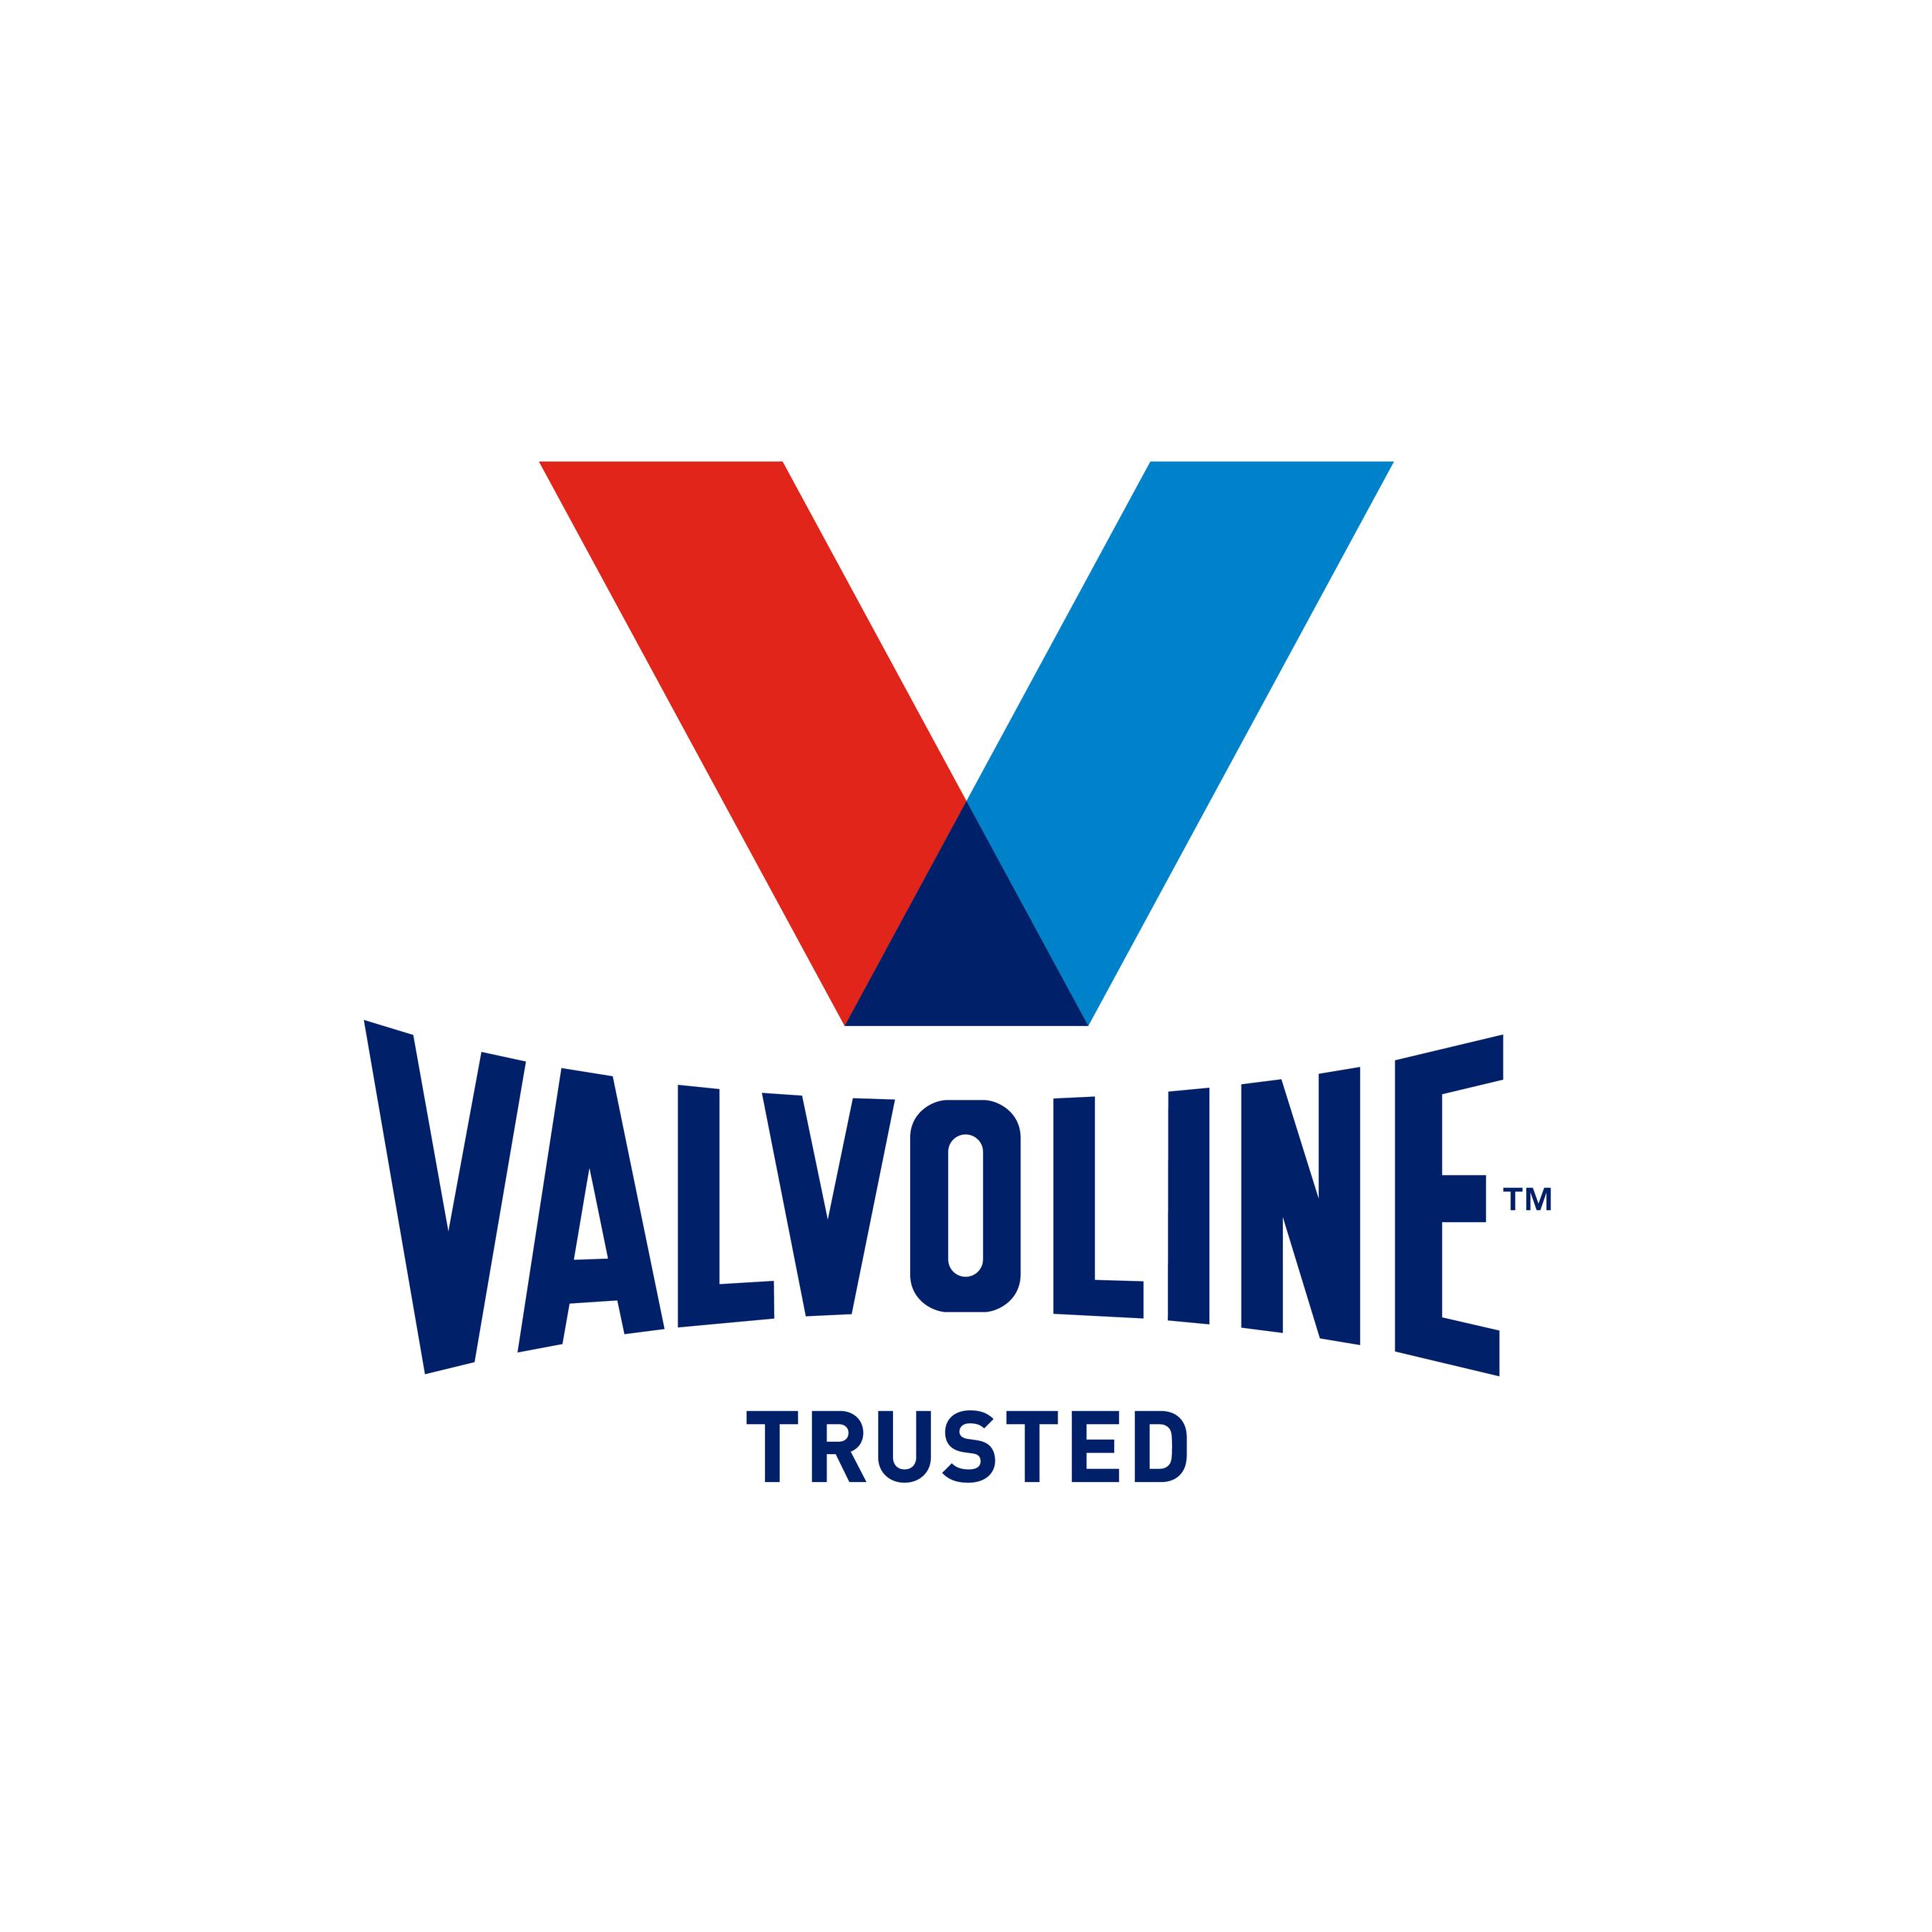 (PRNewsfoto/Valvoline Inc.)